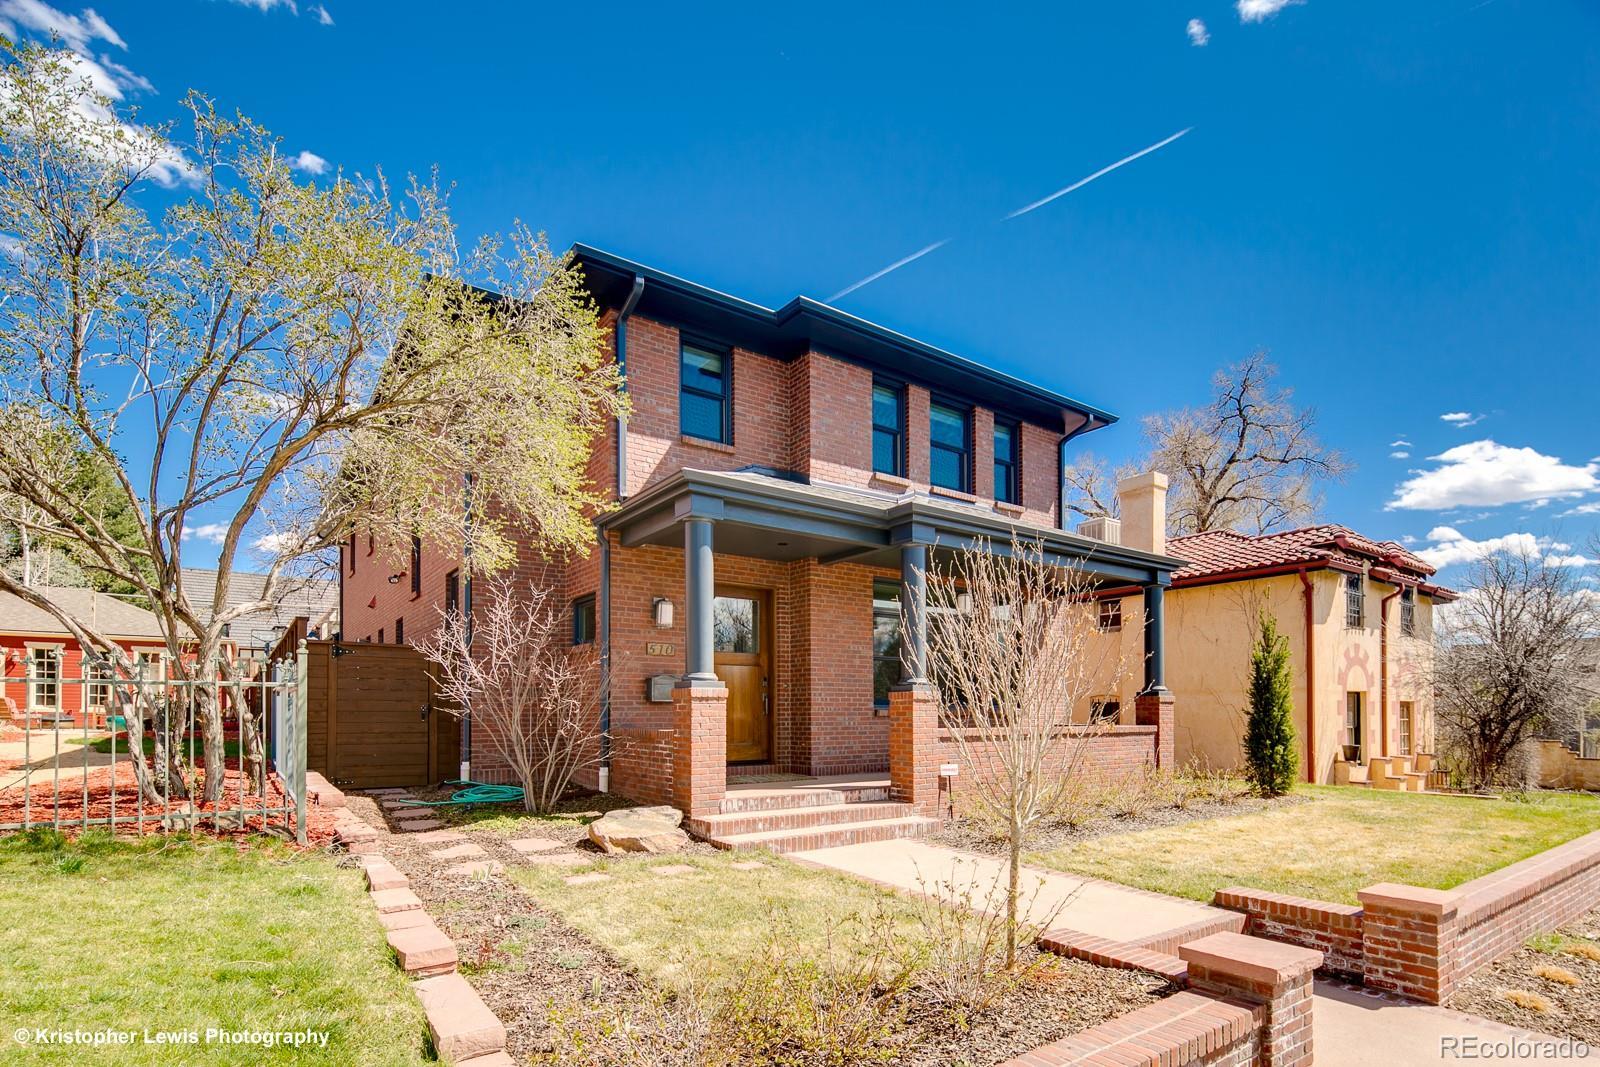 MLS# 3442309 - 2 - 510 N High Street, Denver, CO 80218